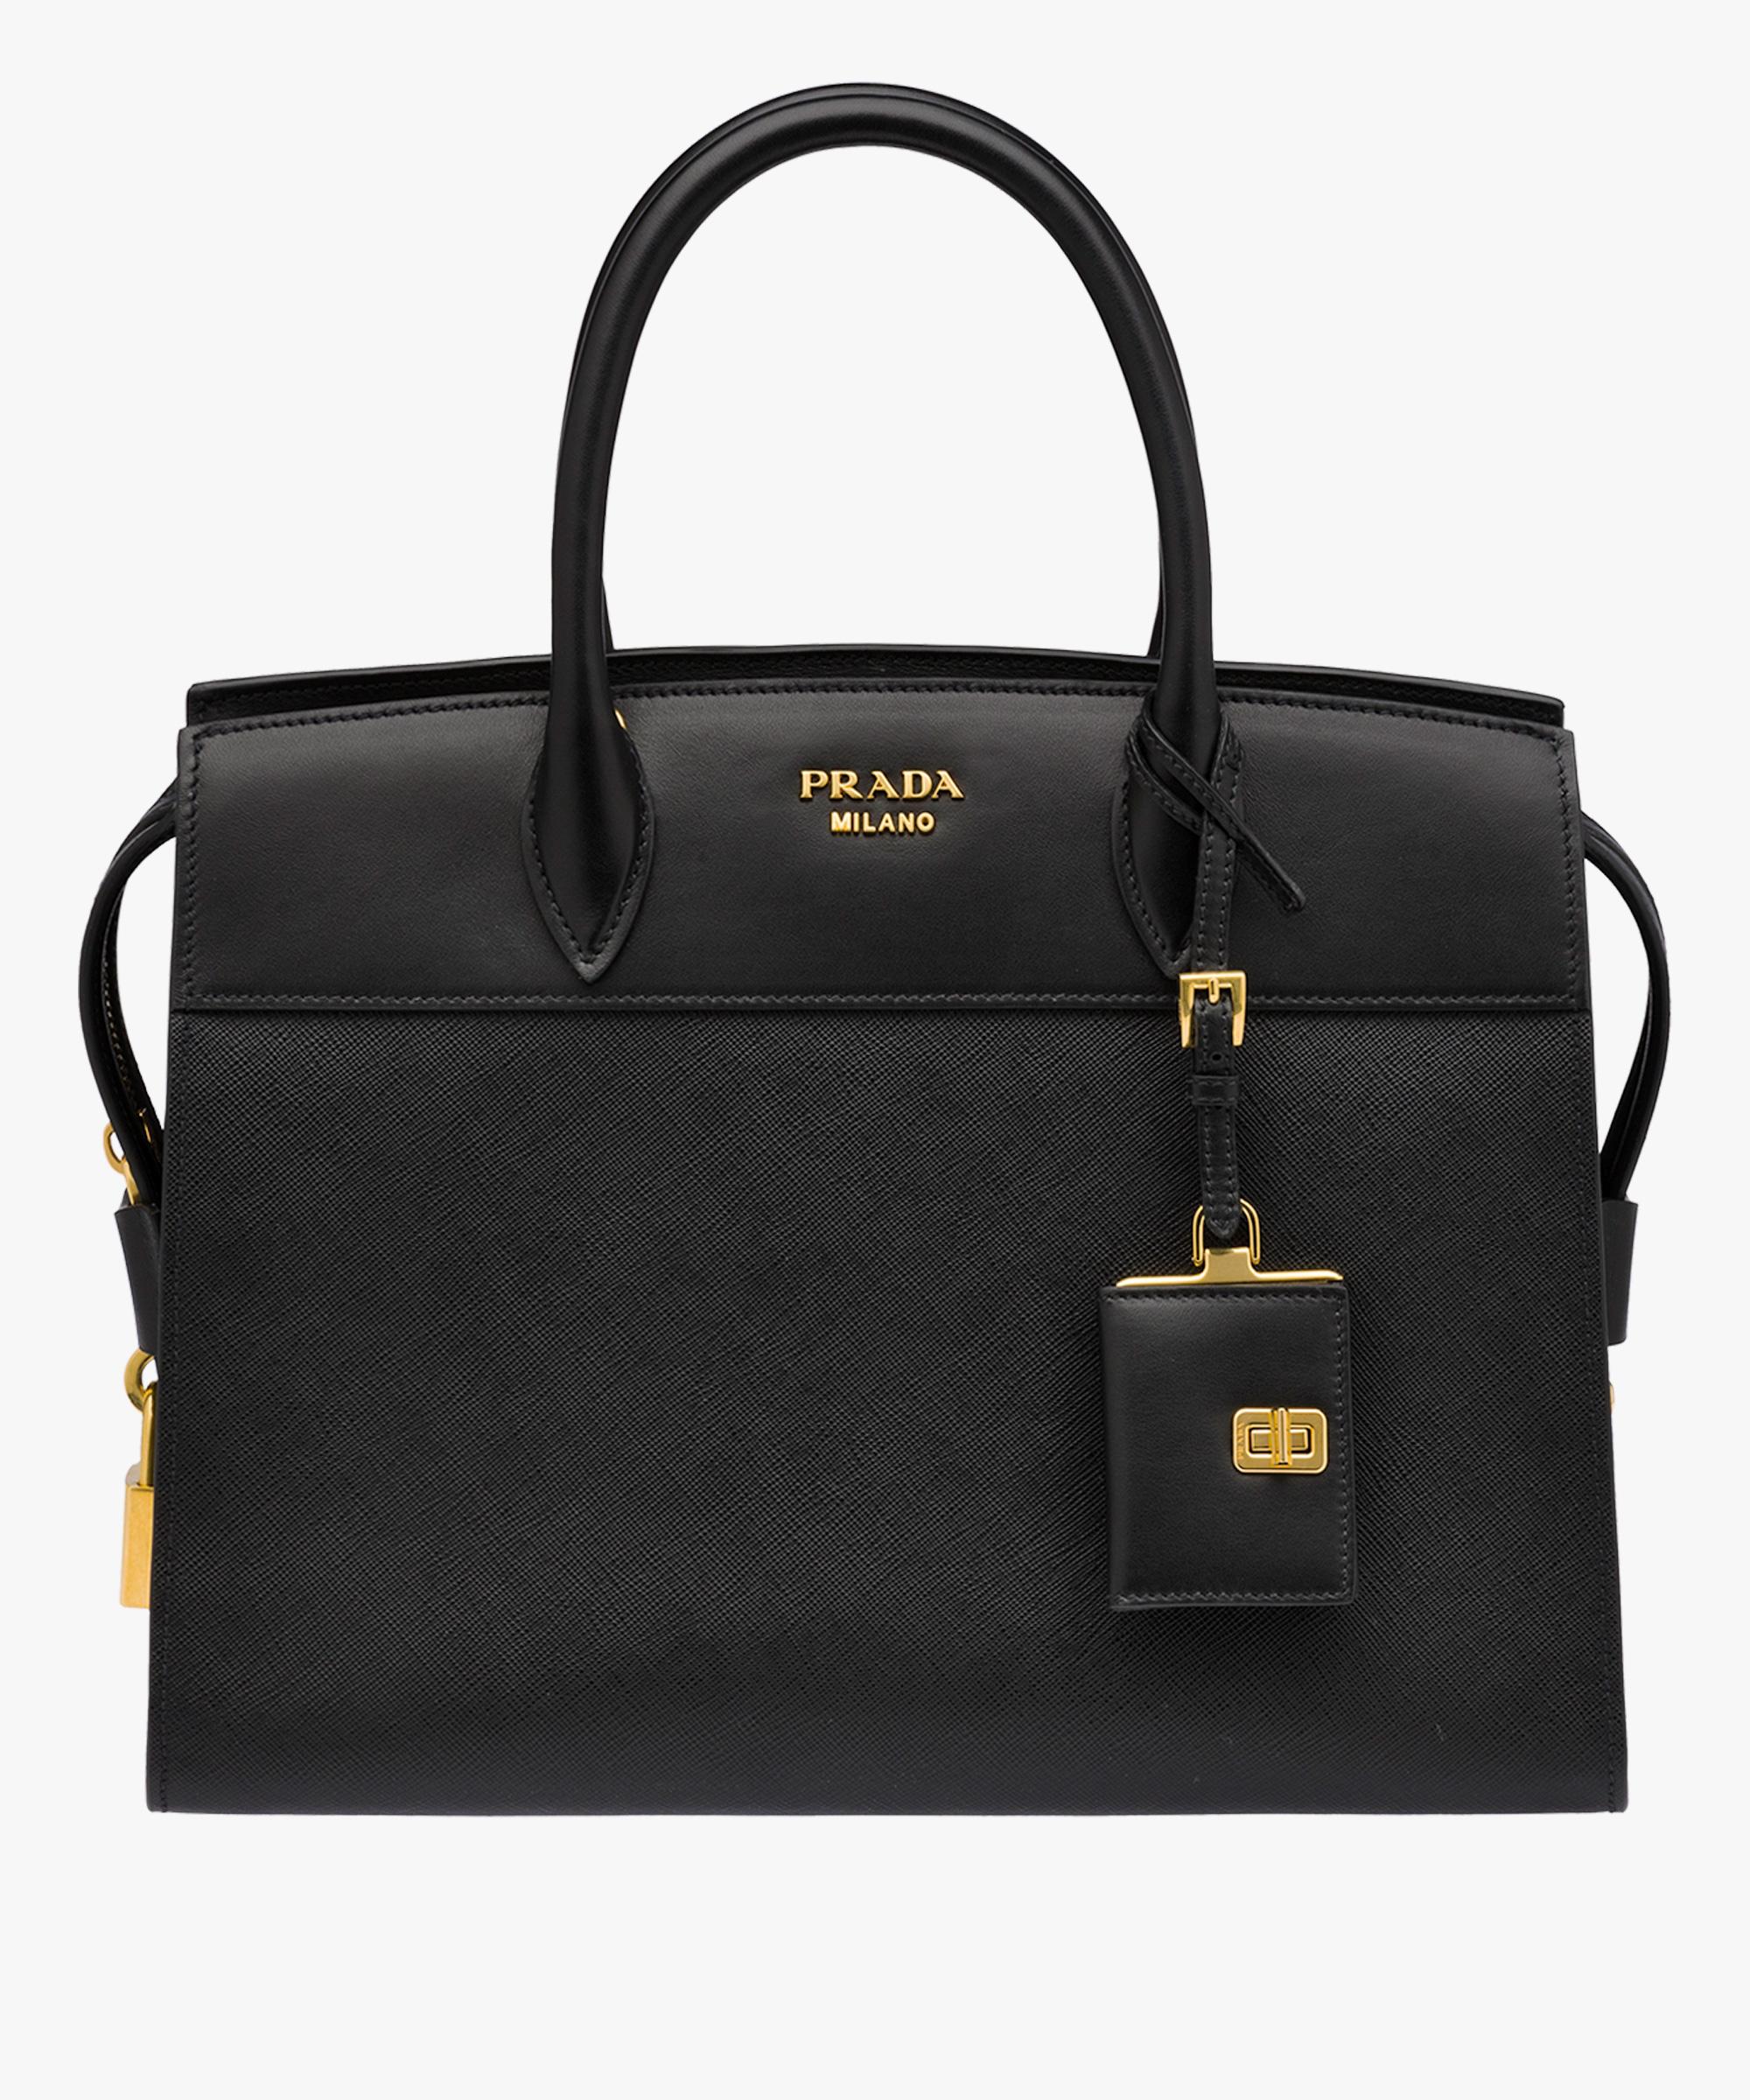 ae0d66f2d934 Esplanade leather bag Prada BLACK; Esplanade leather bag Prada BLACK ...